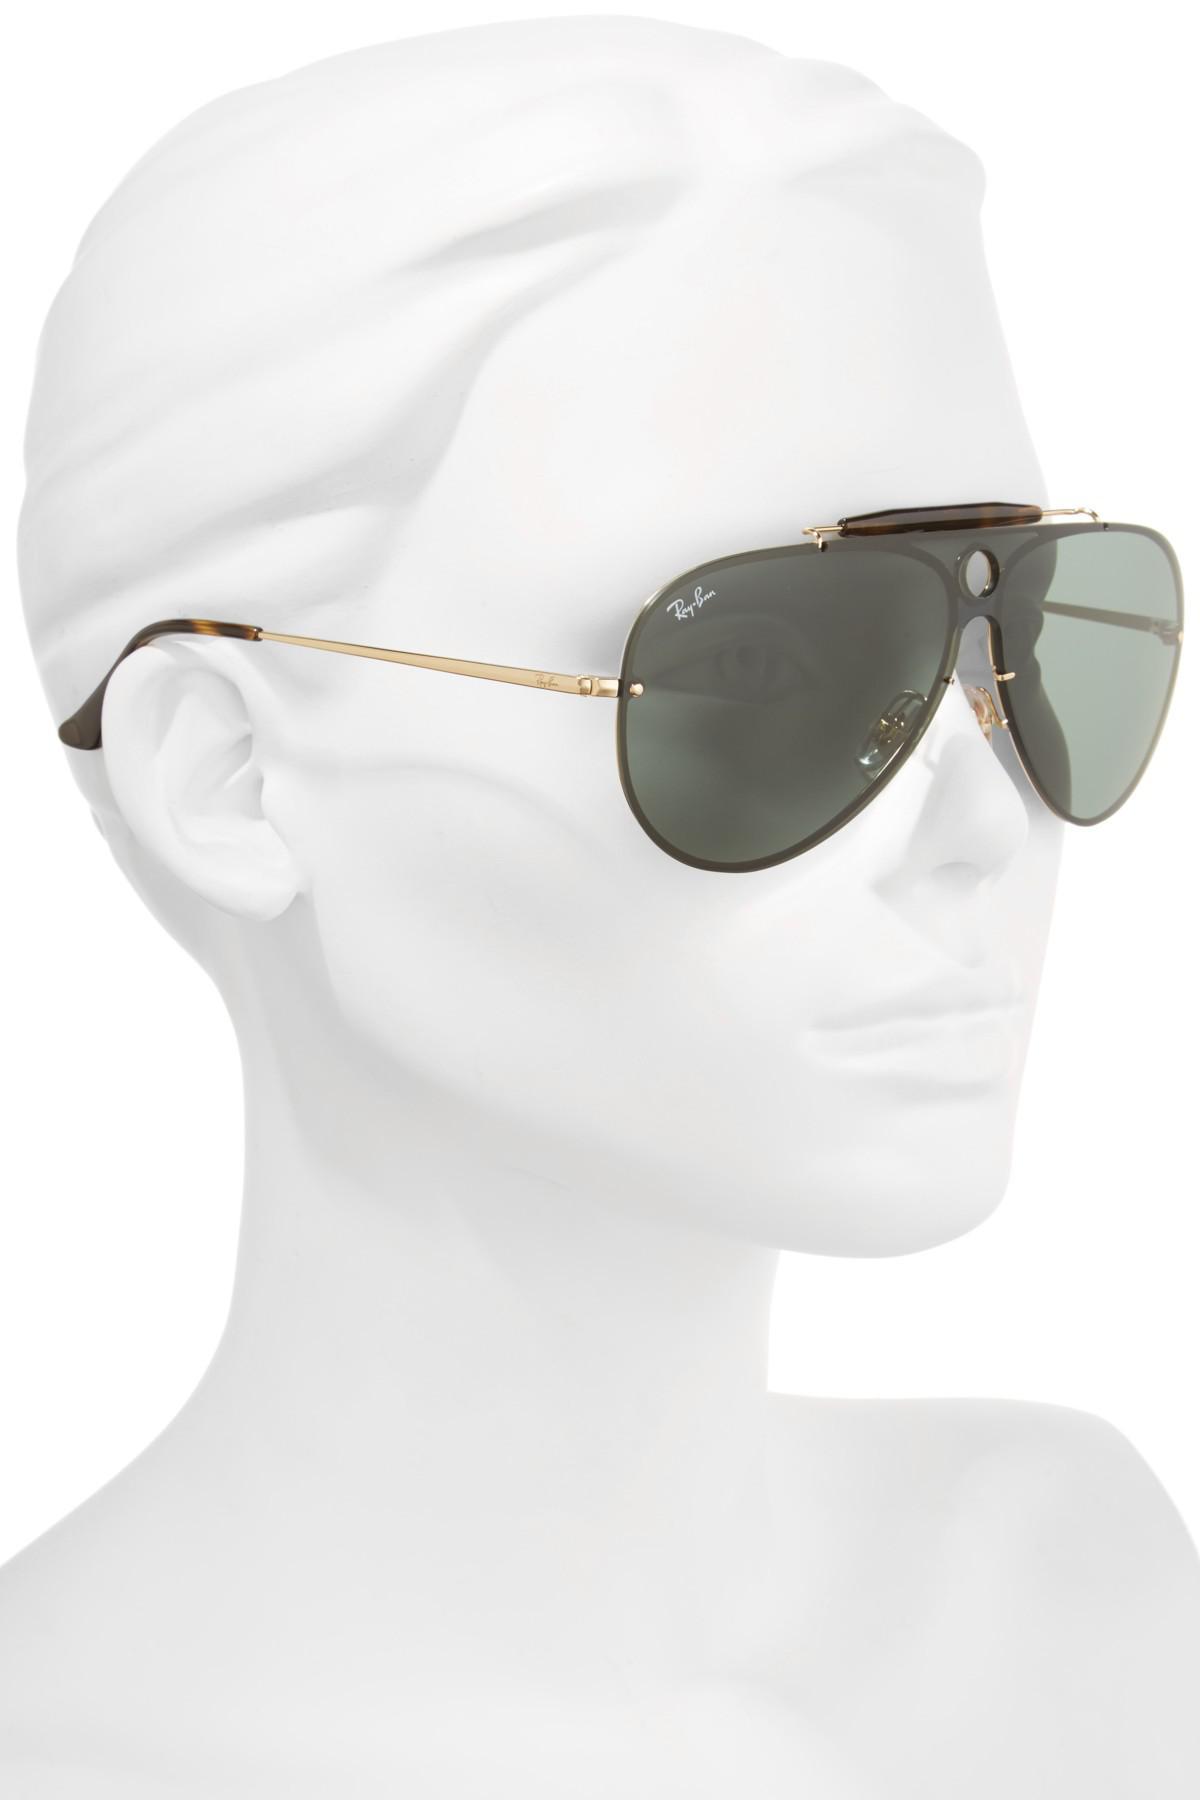 0206ab1cf4213 Ray-Ban Blaze Shooter Shield Sunglasses in Metallic - Lyst